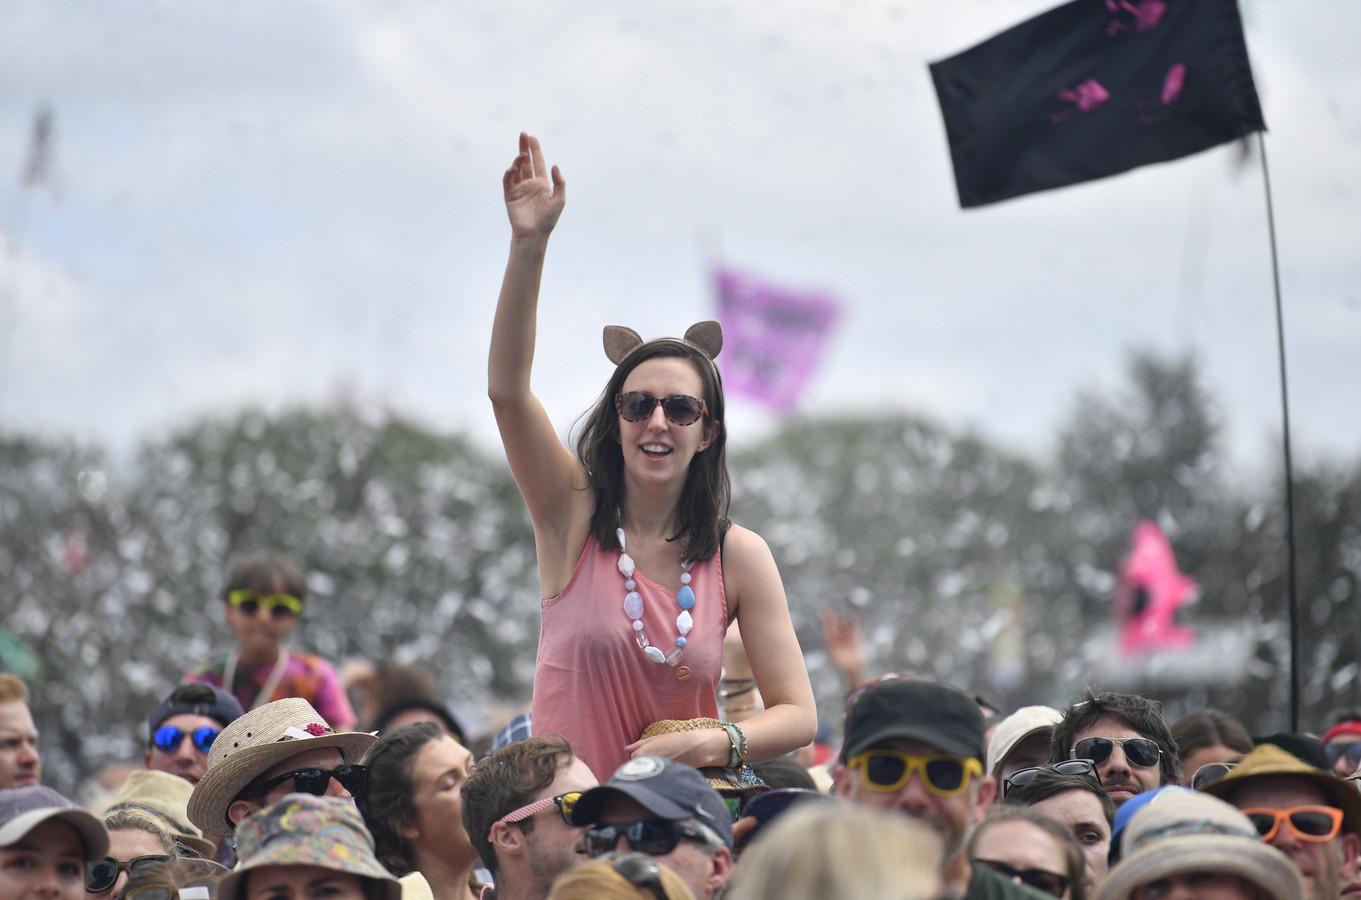 Archiefbeeld: festivalgangers op Glastonbury in 2019.